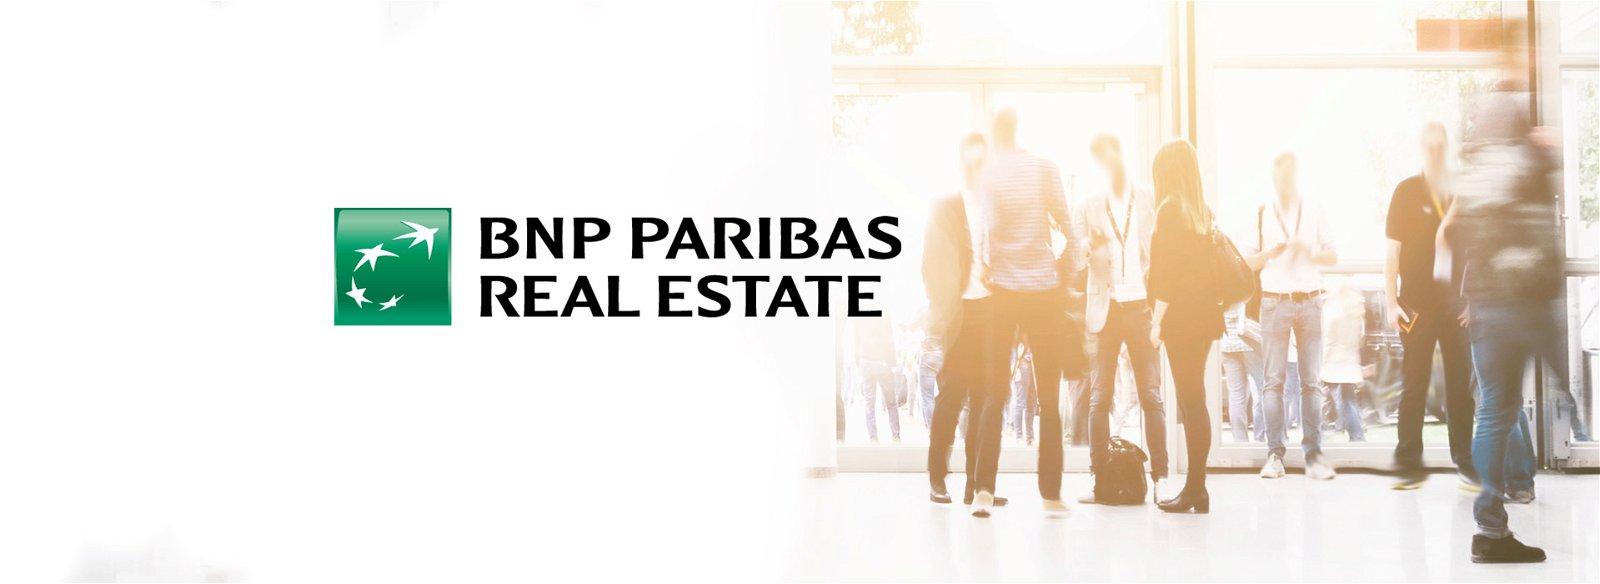 BNP Paribase Real Estate use TRAMPS